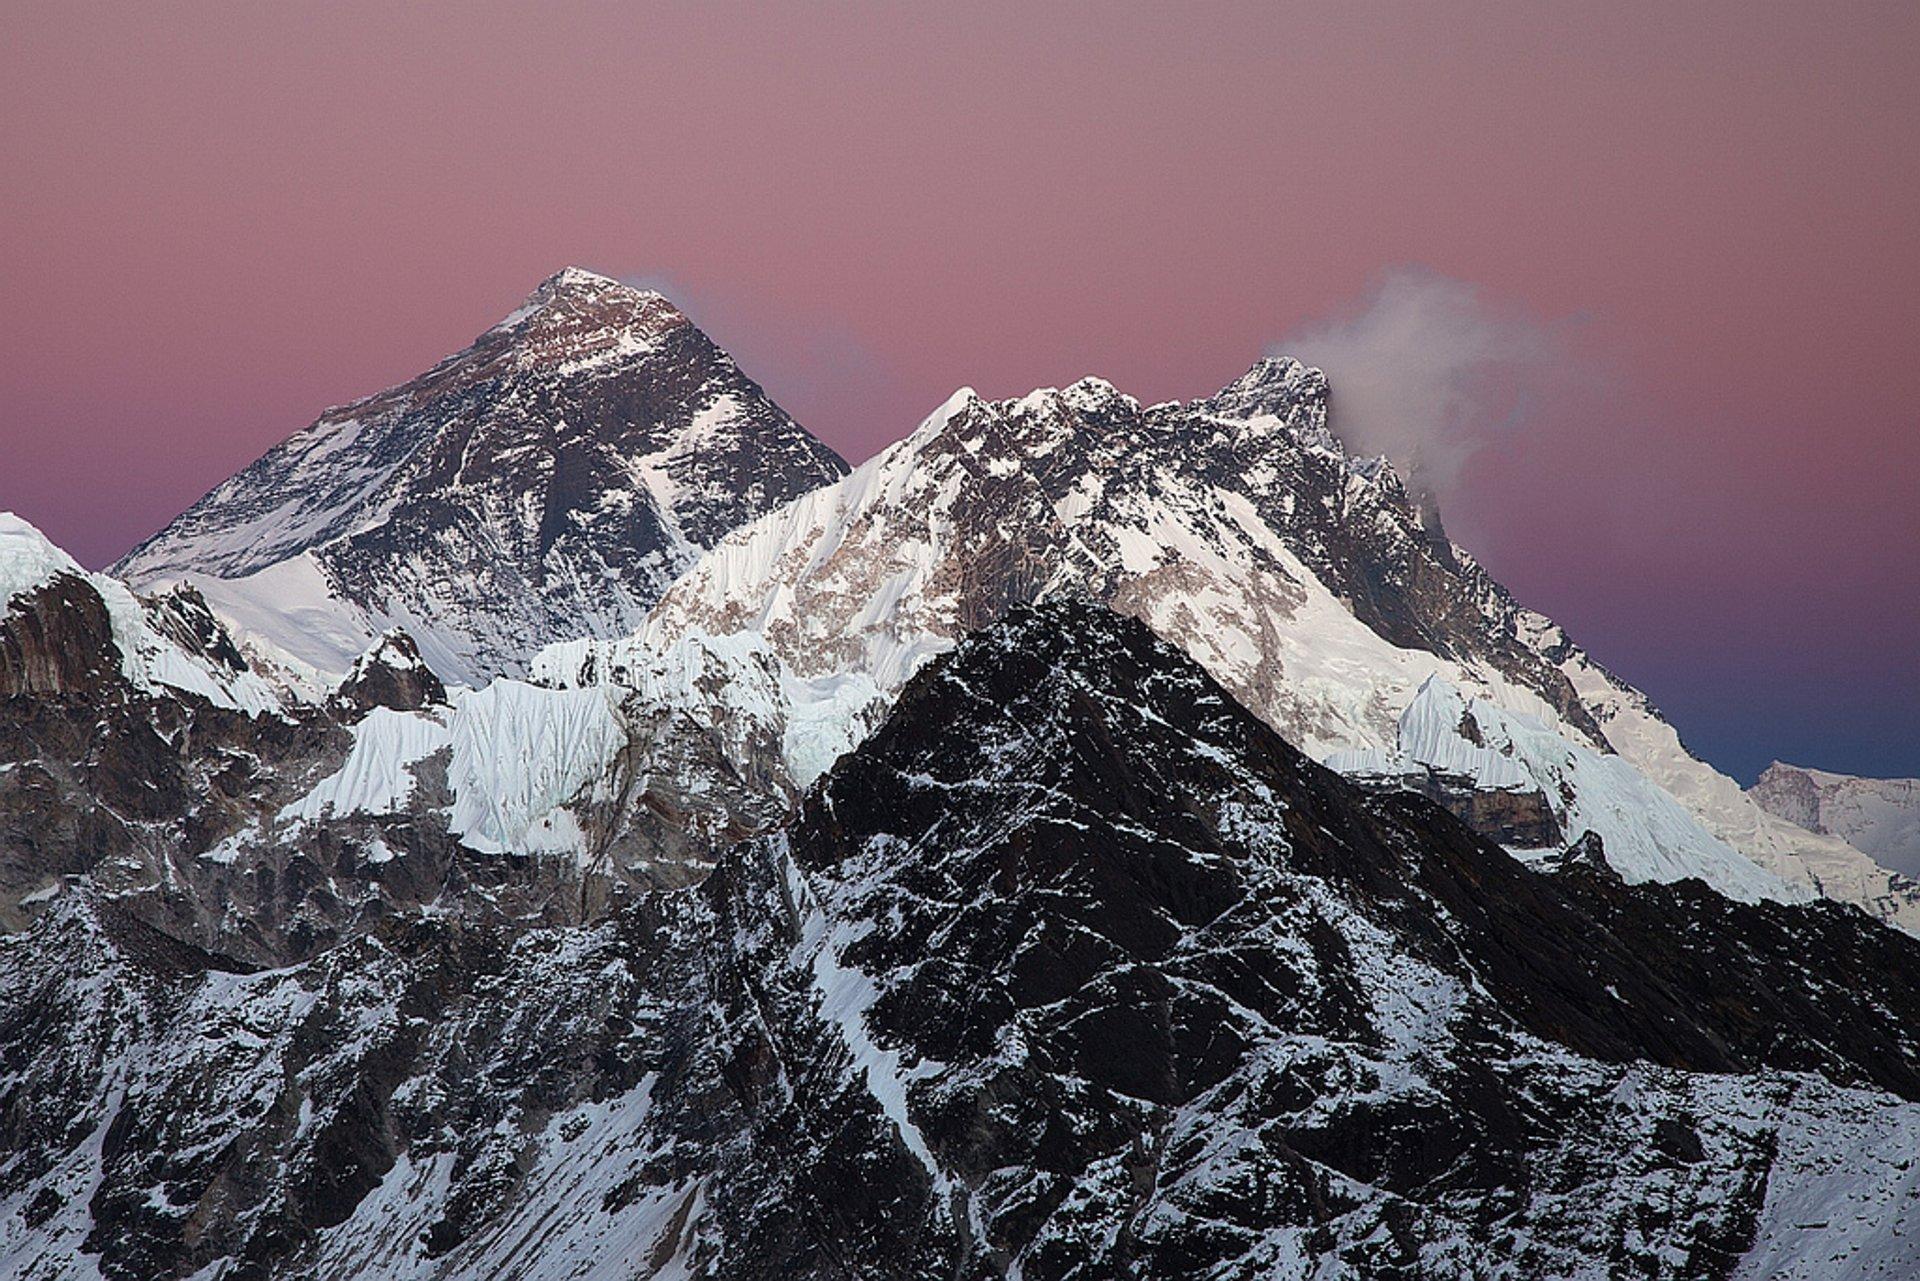 Mt. Everest and Lhotse  2020